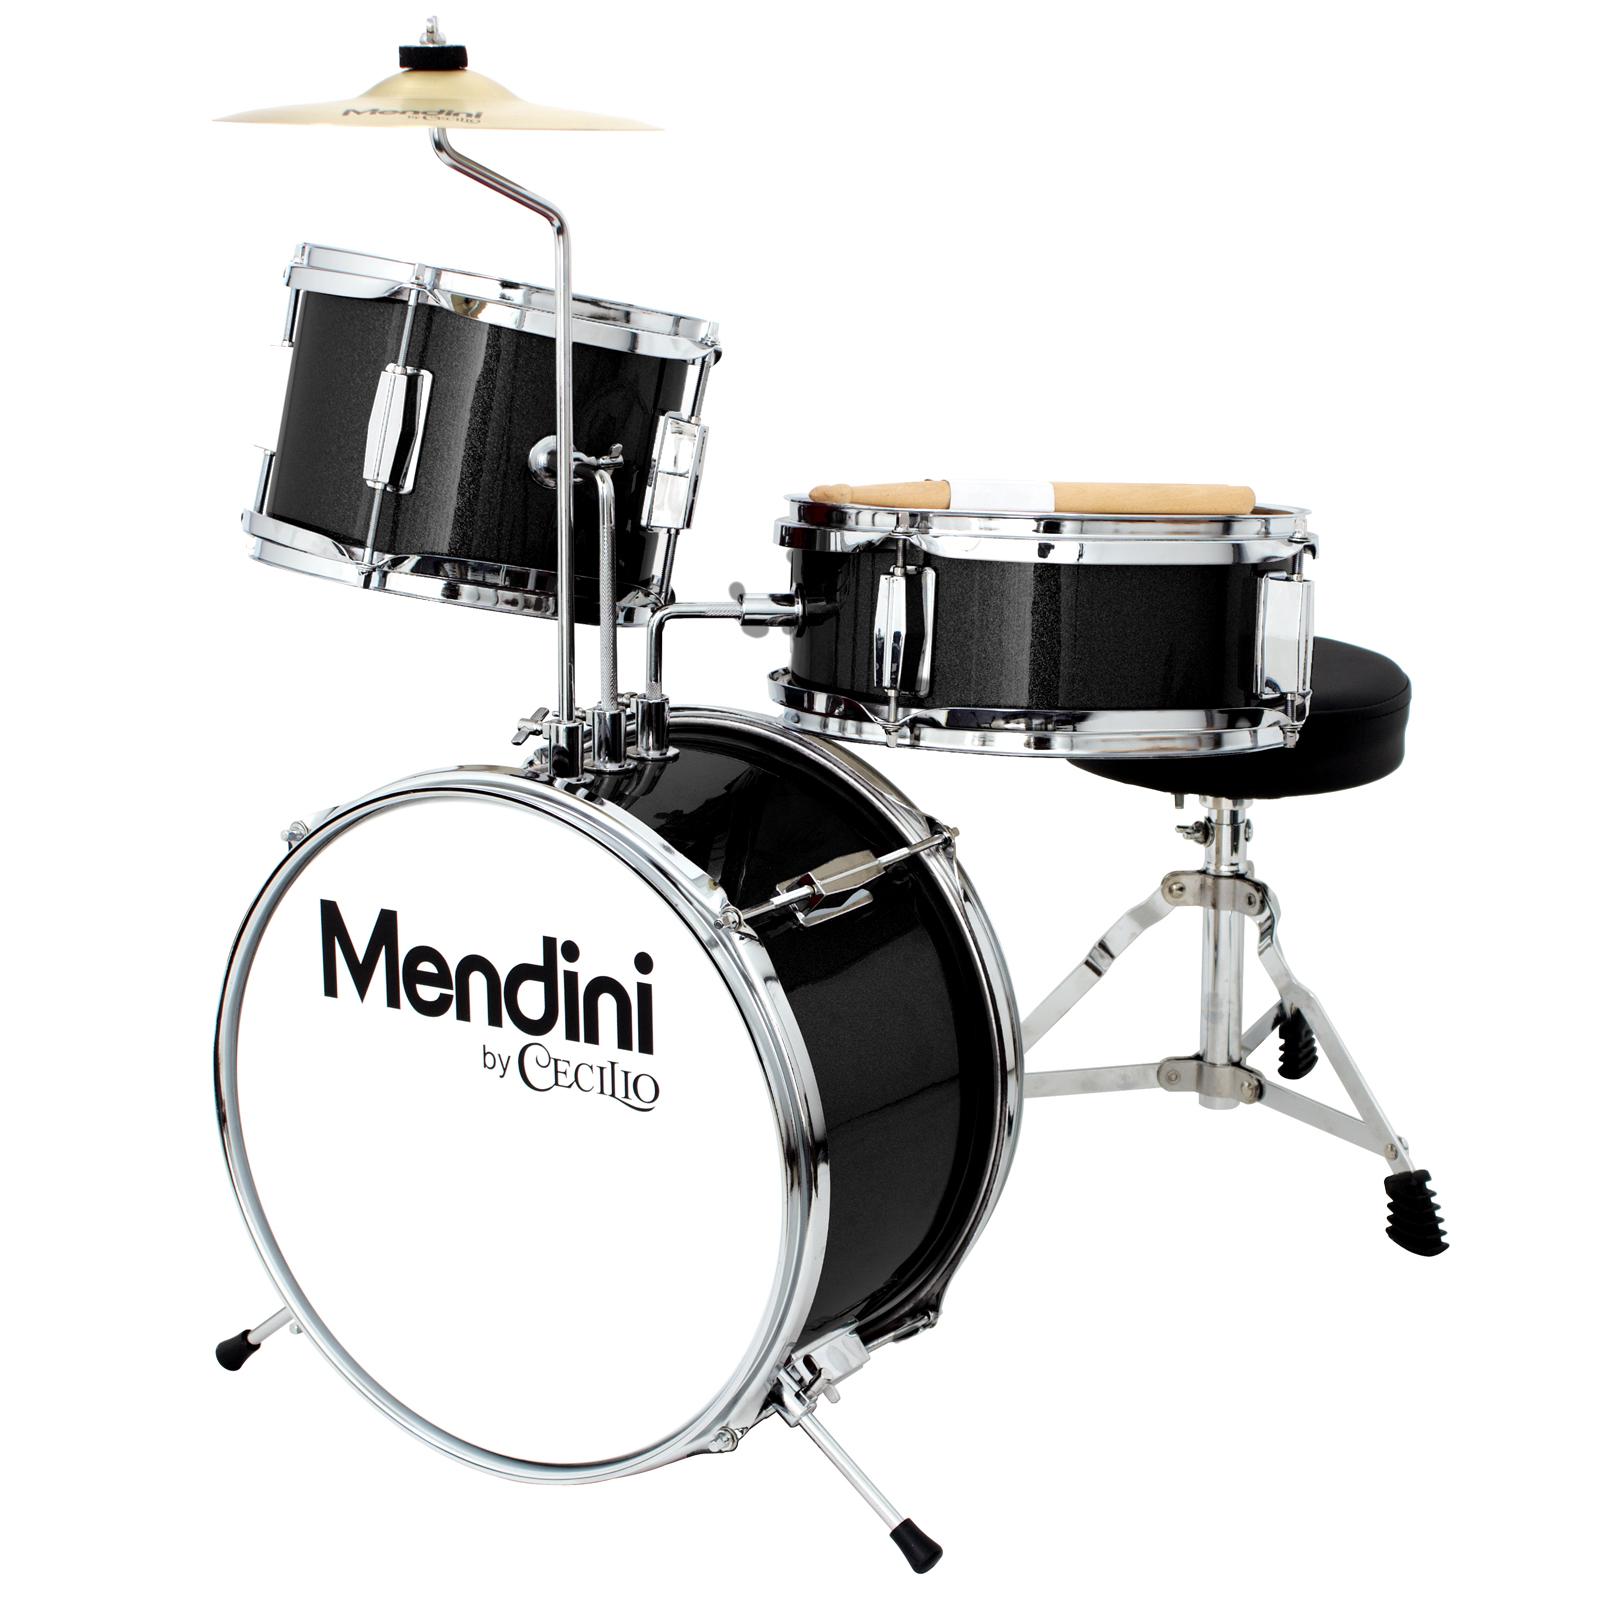 Mendini by Cecilio 13 Inch 3-Piece Kids / Junior Drum Set with Adjustable Throne, Cymbal, Pedal & Drumsticks, Metallic Black, MJDS-1-BK